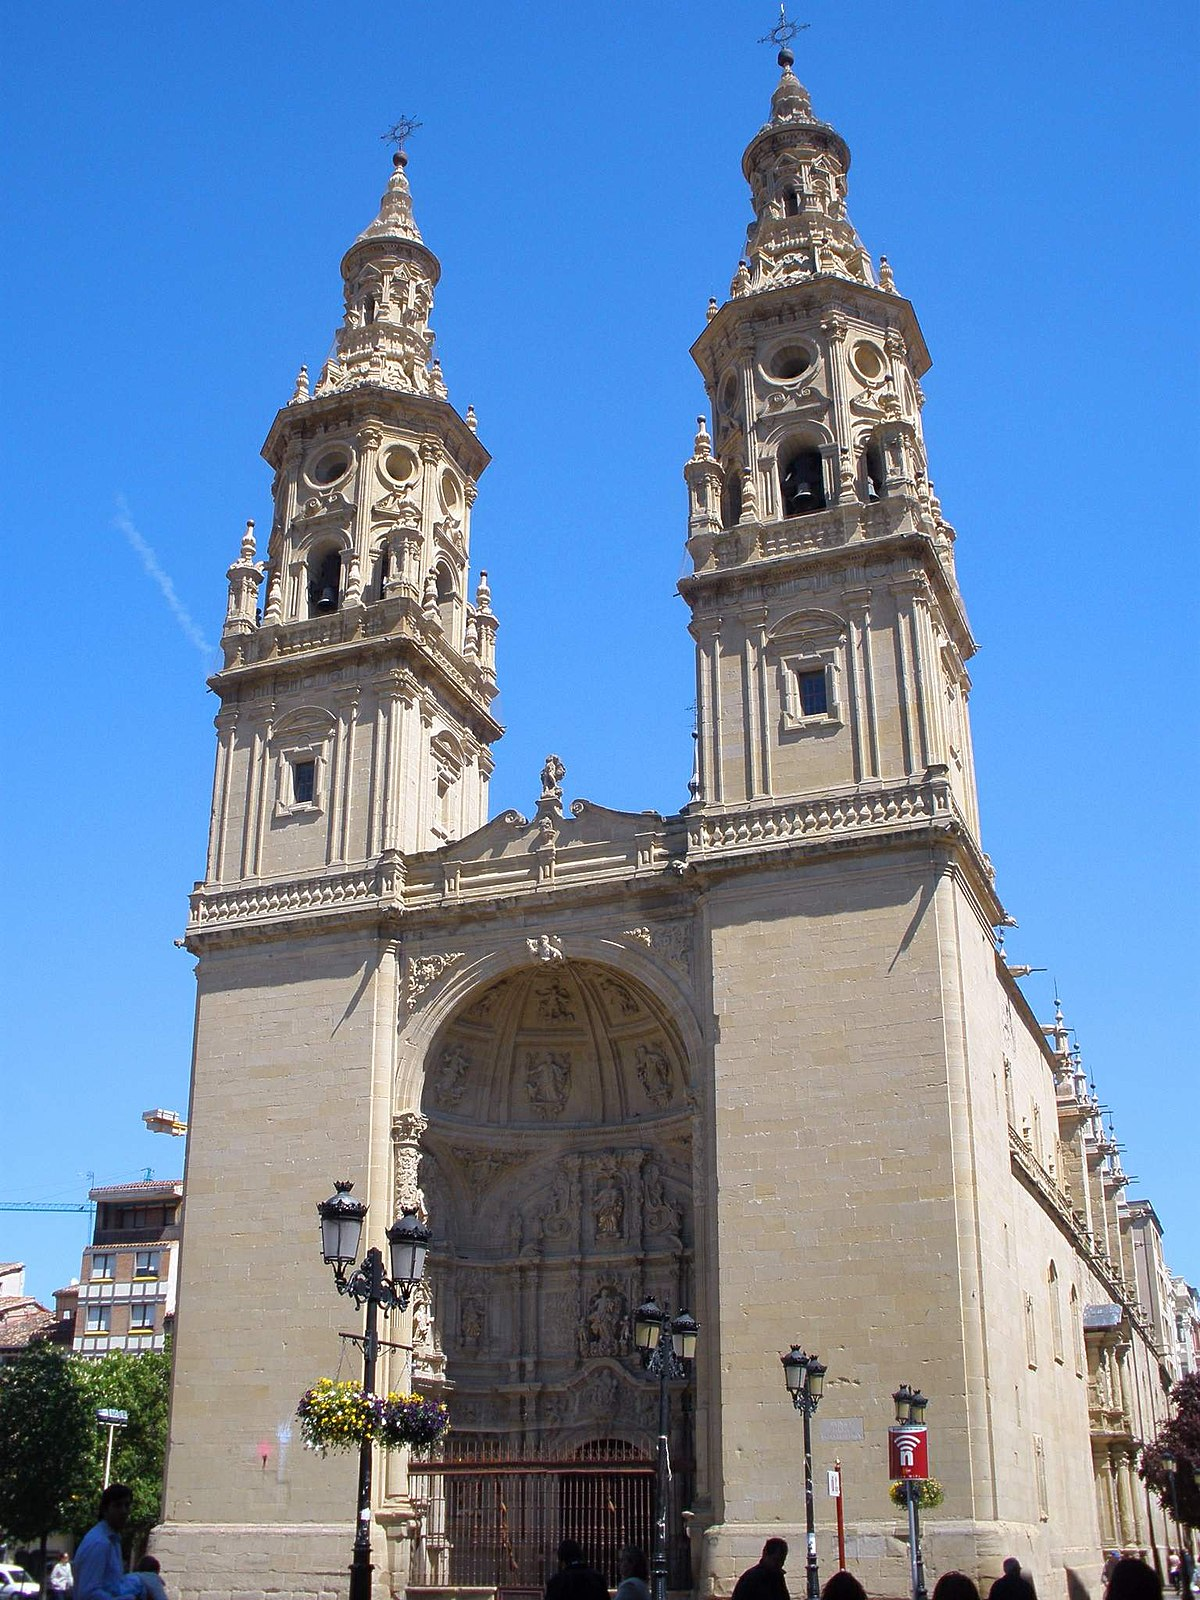 Concatedral de Logroño - Wikipedia, la enciclopedia libre